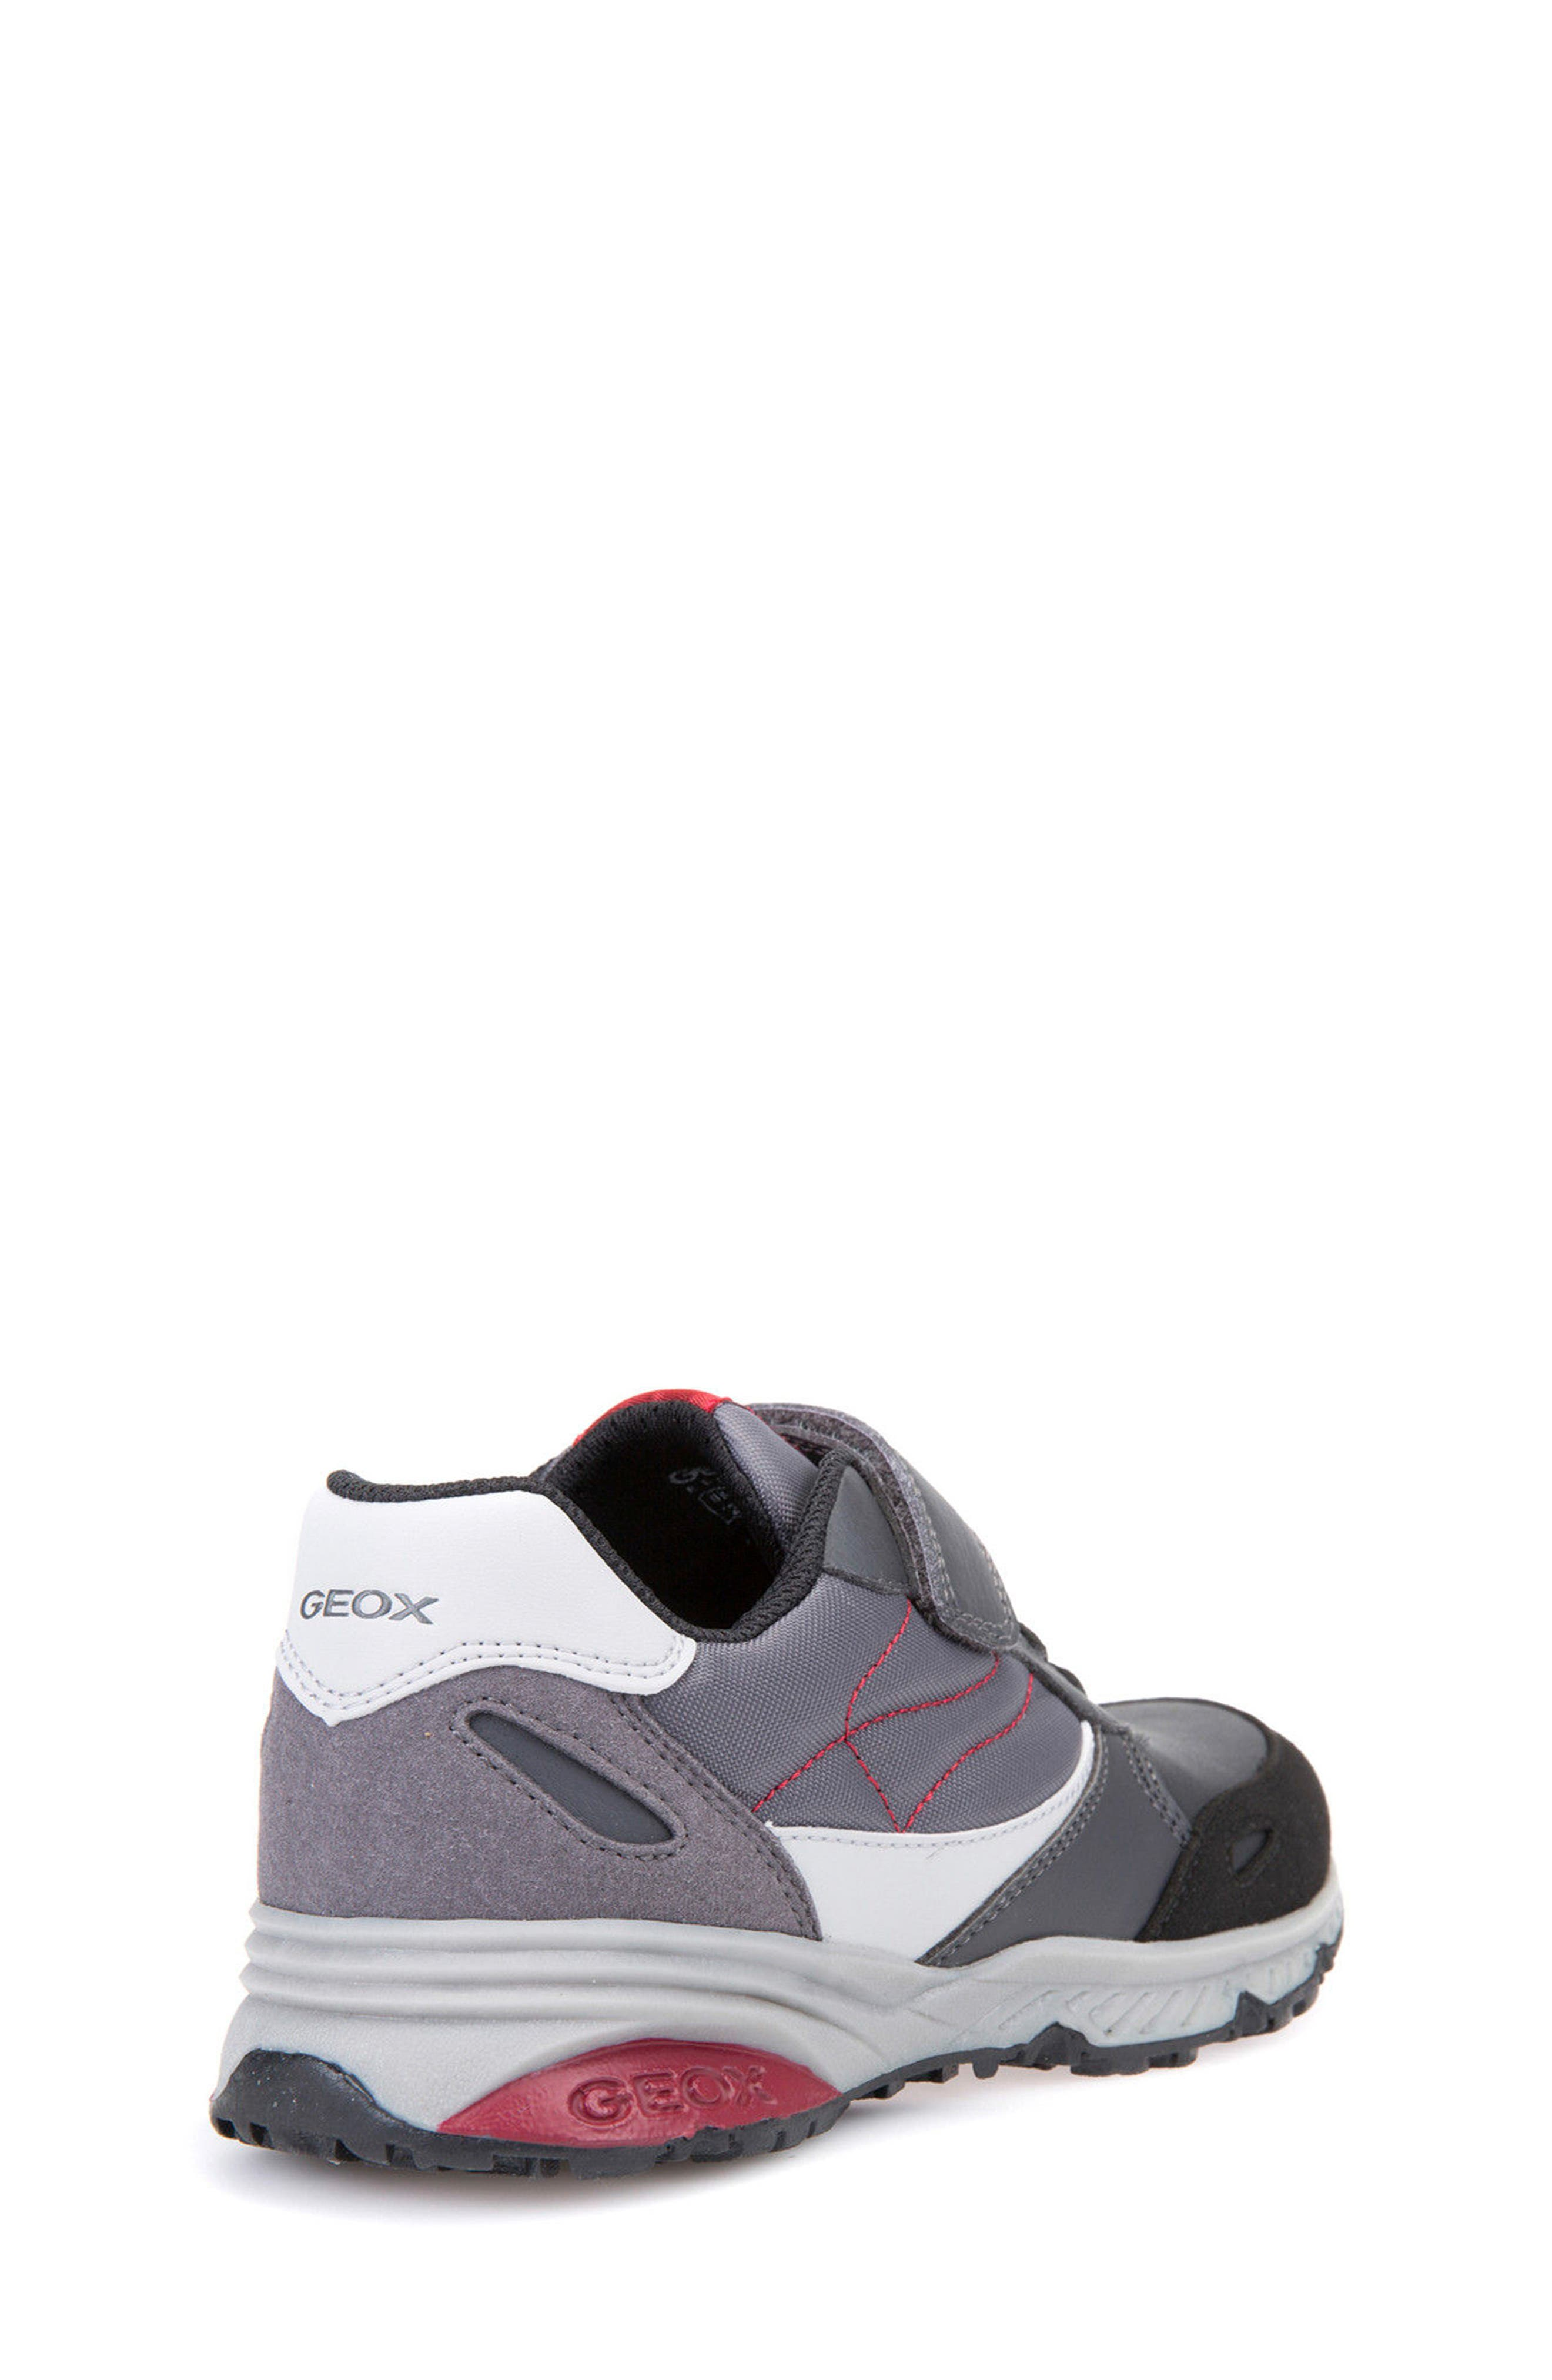 Jr Bernie Sneaker,                             Alternate thumbnail 2, color,                             074